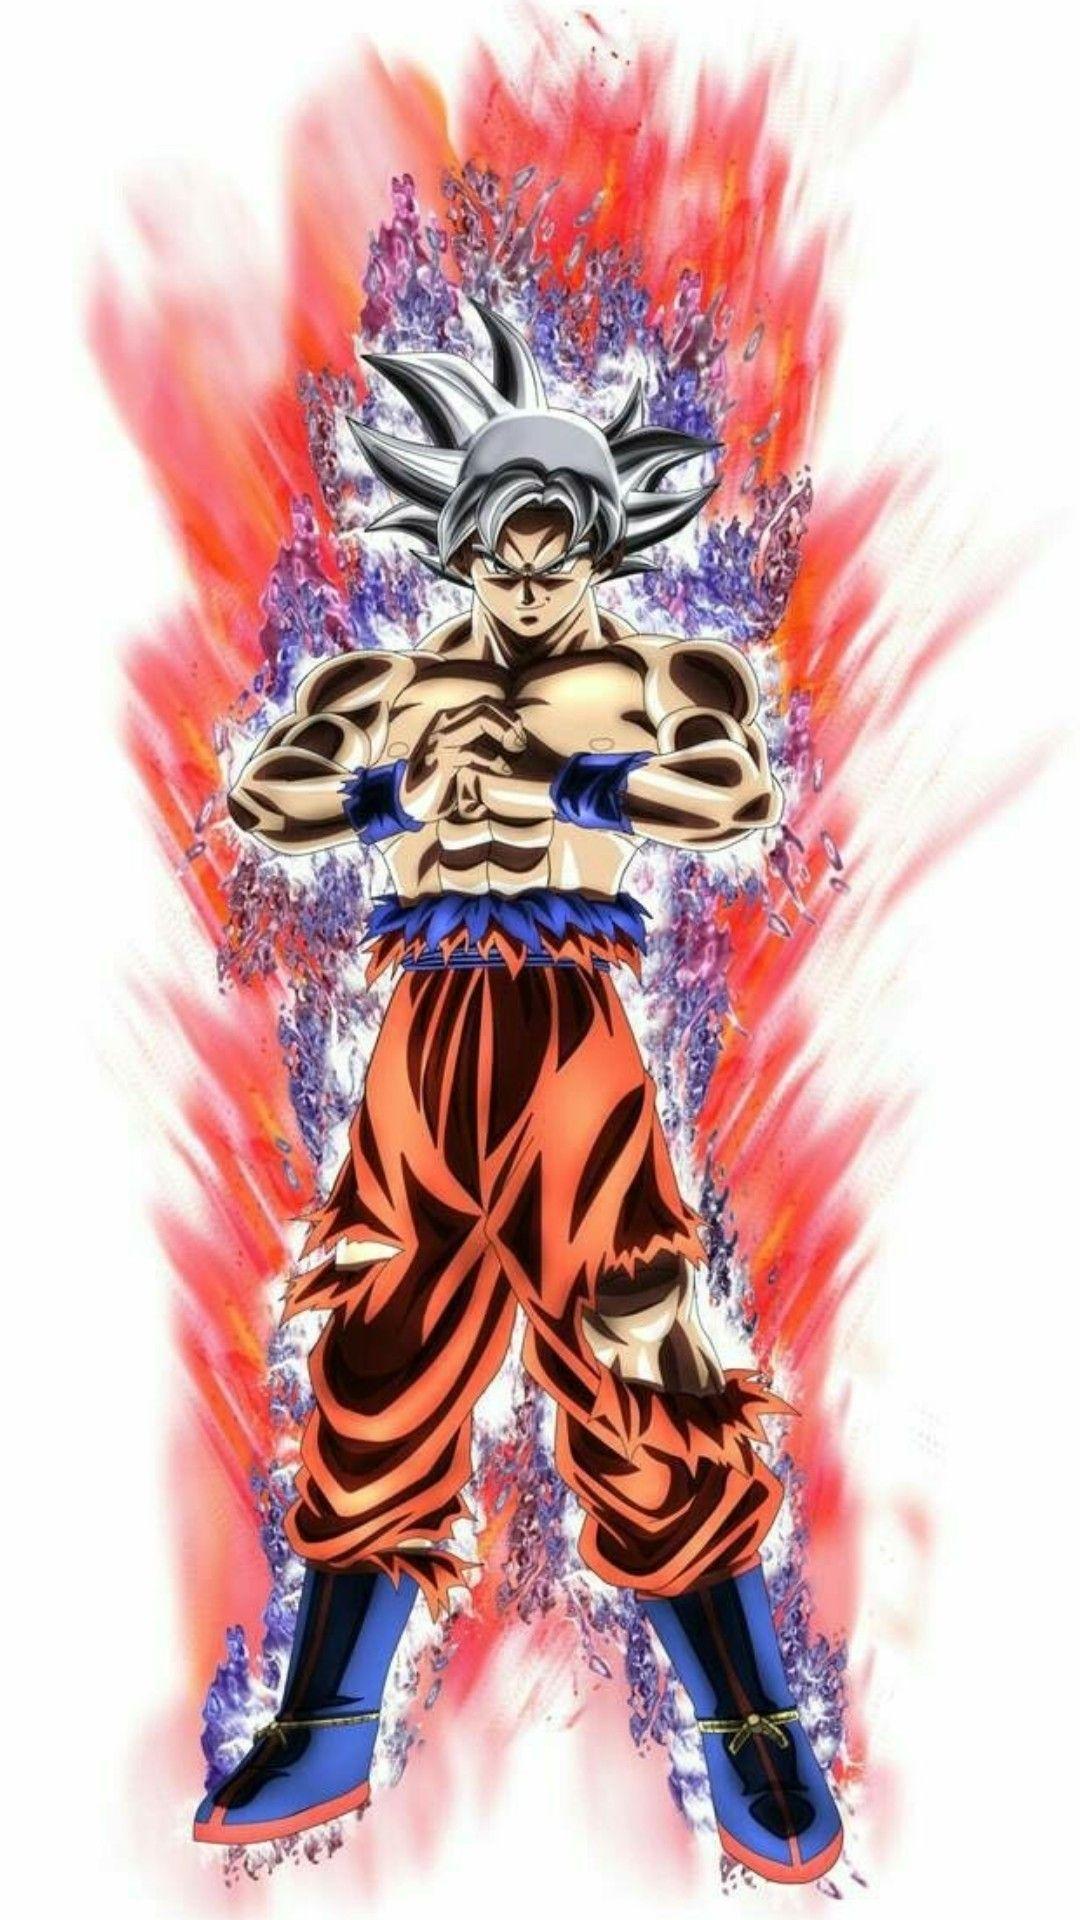 Goku En Su Fase Mas Poderosa Por Ahora Goku Ultra Instinto Dominado